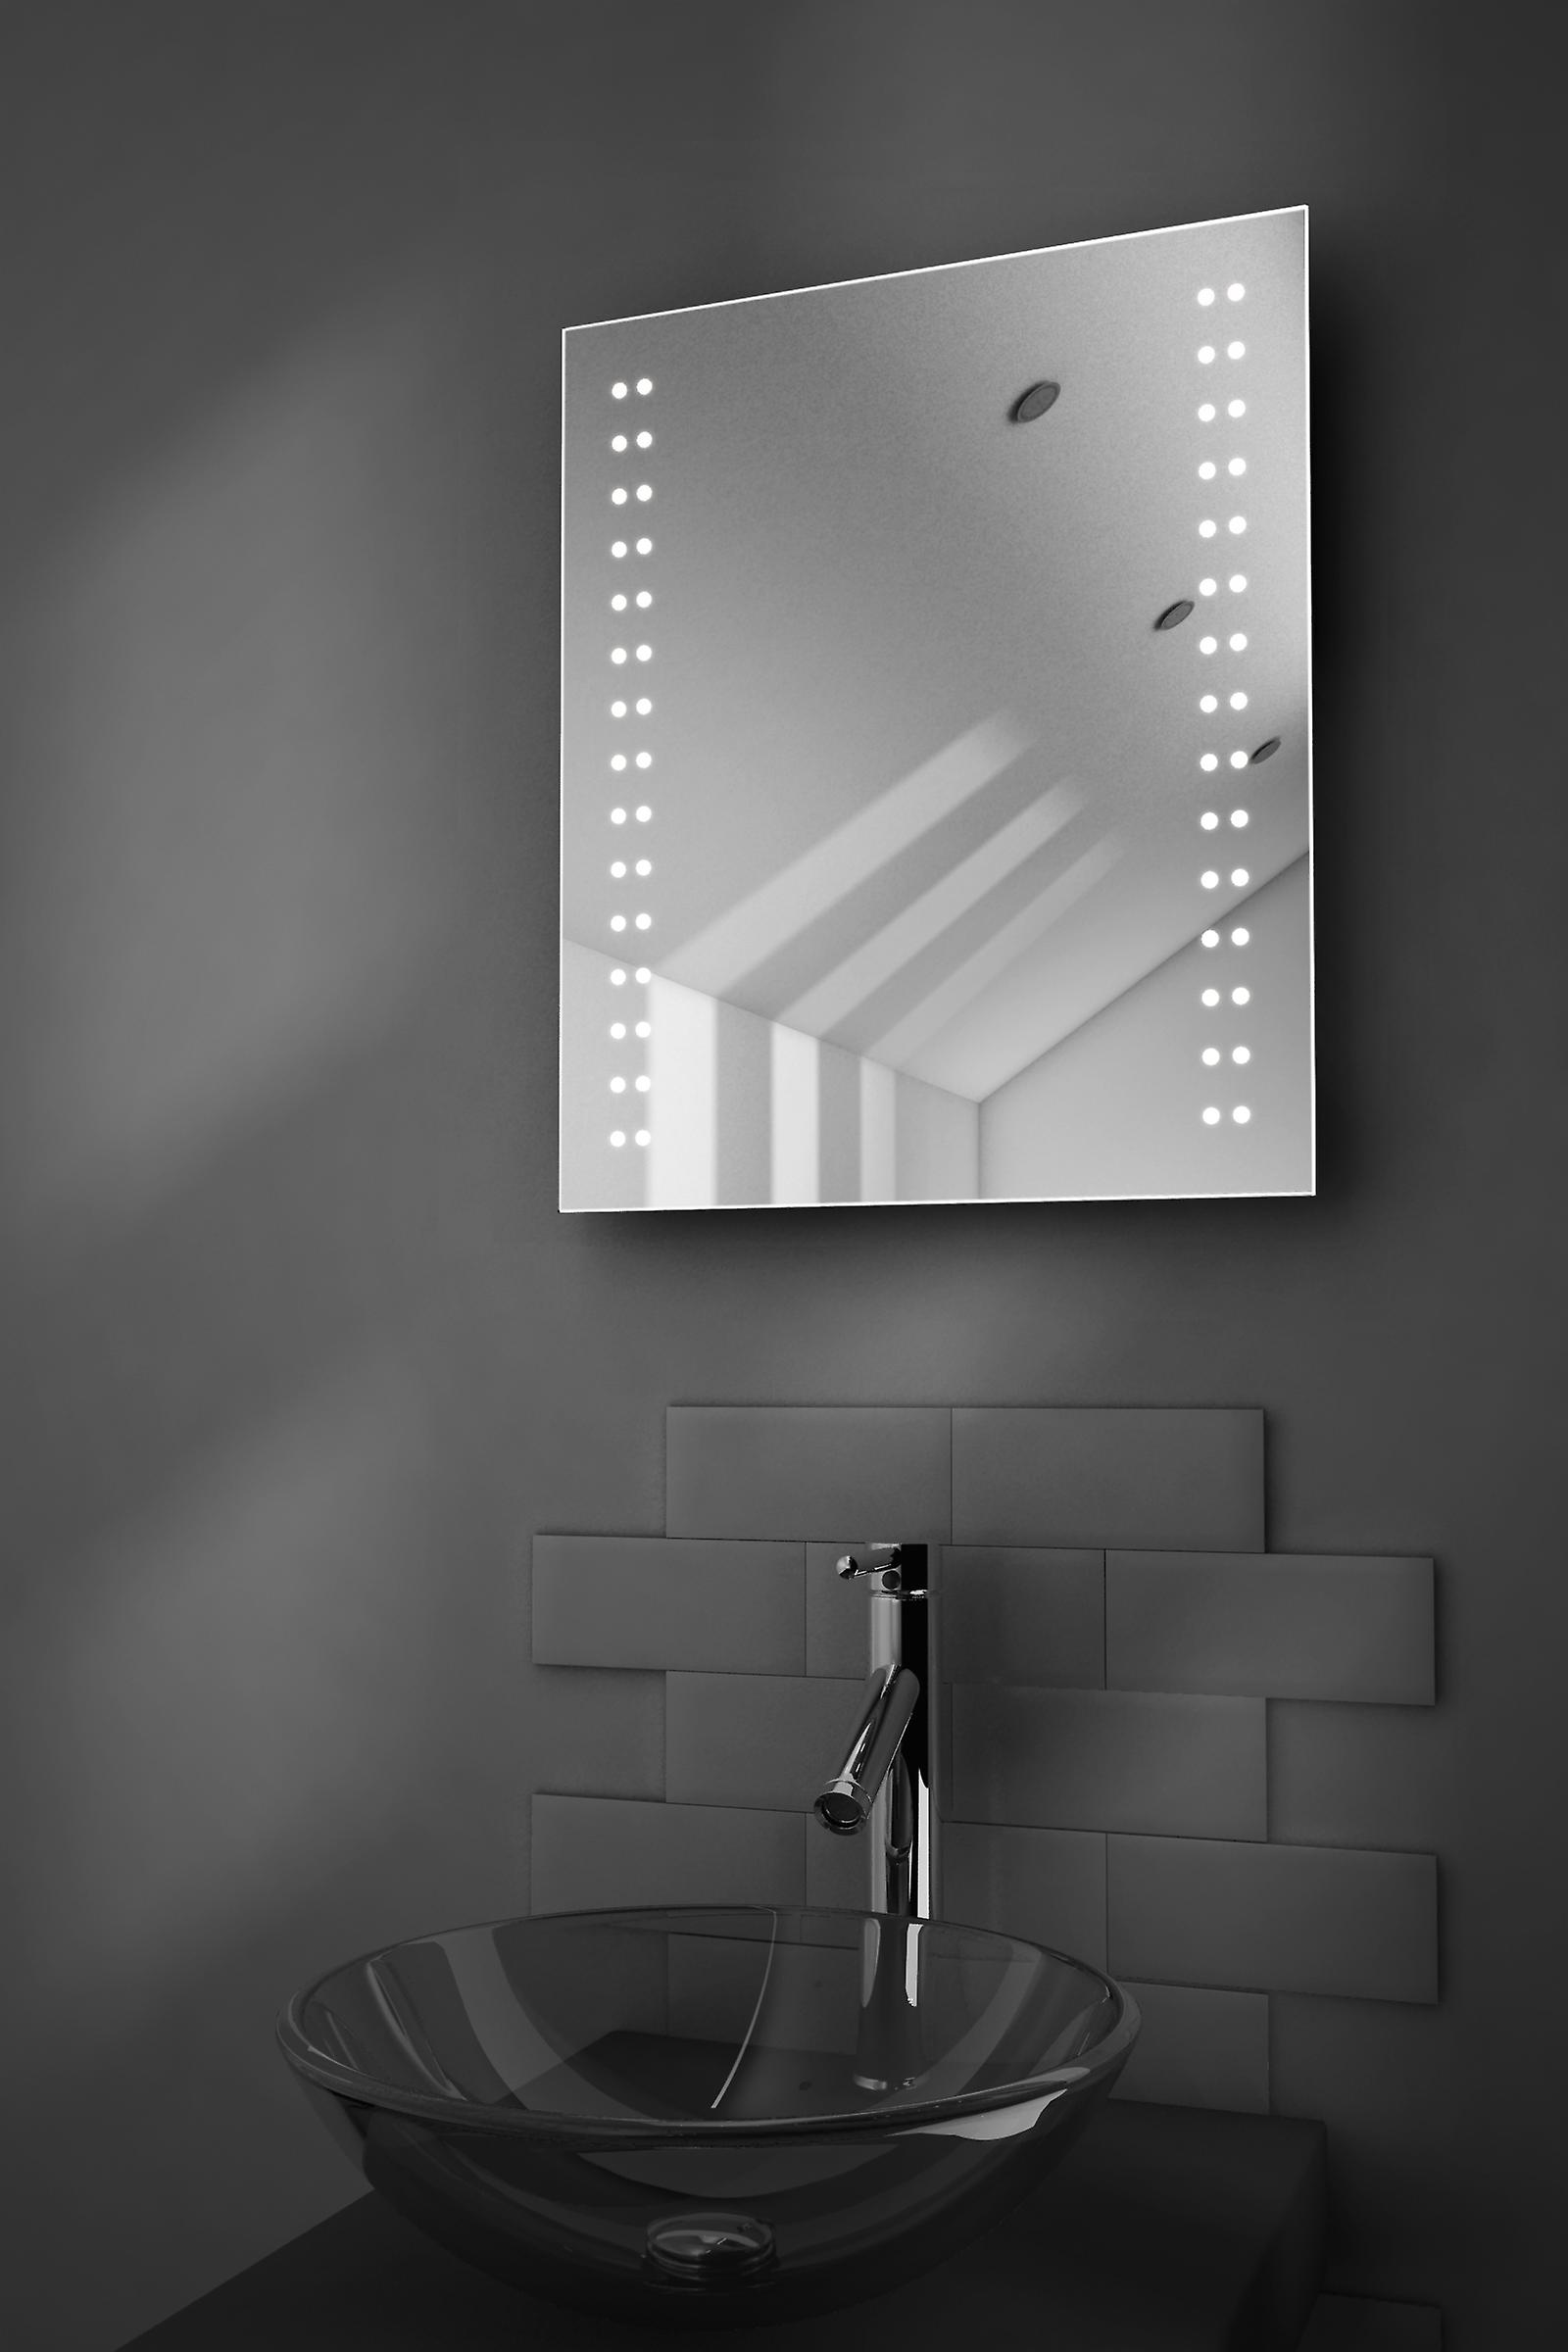 Fantasy Shaver LED Bathroom Mirror With Demister Pad & Sensor k38s